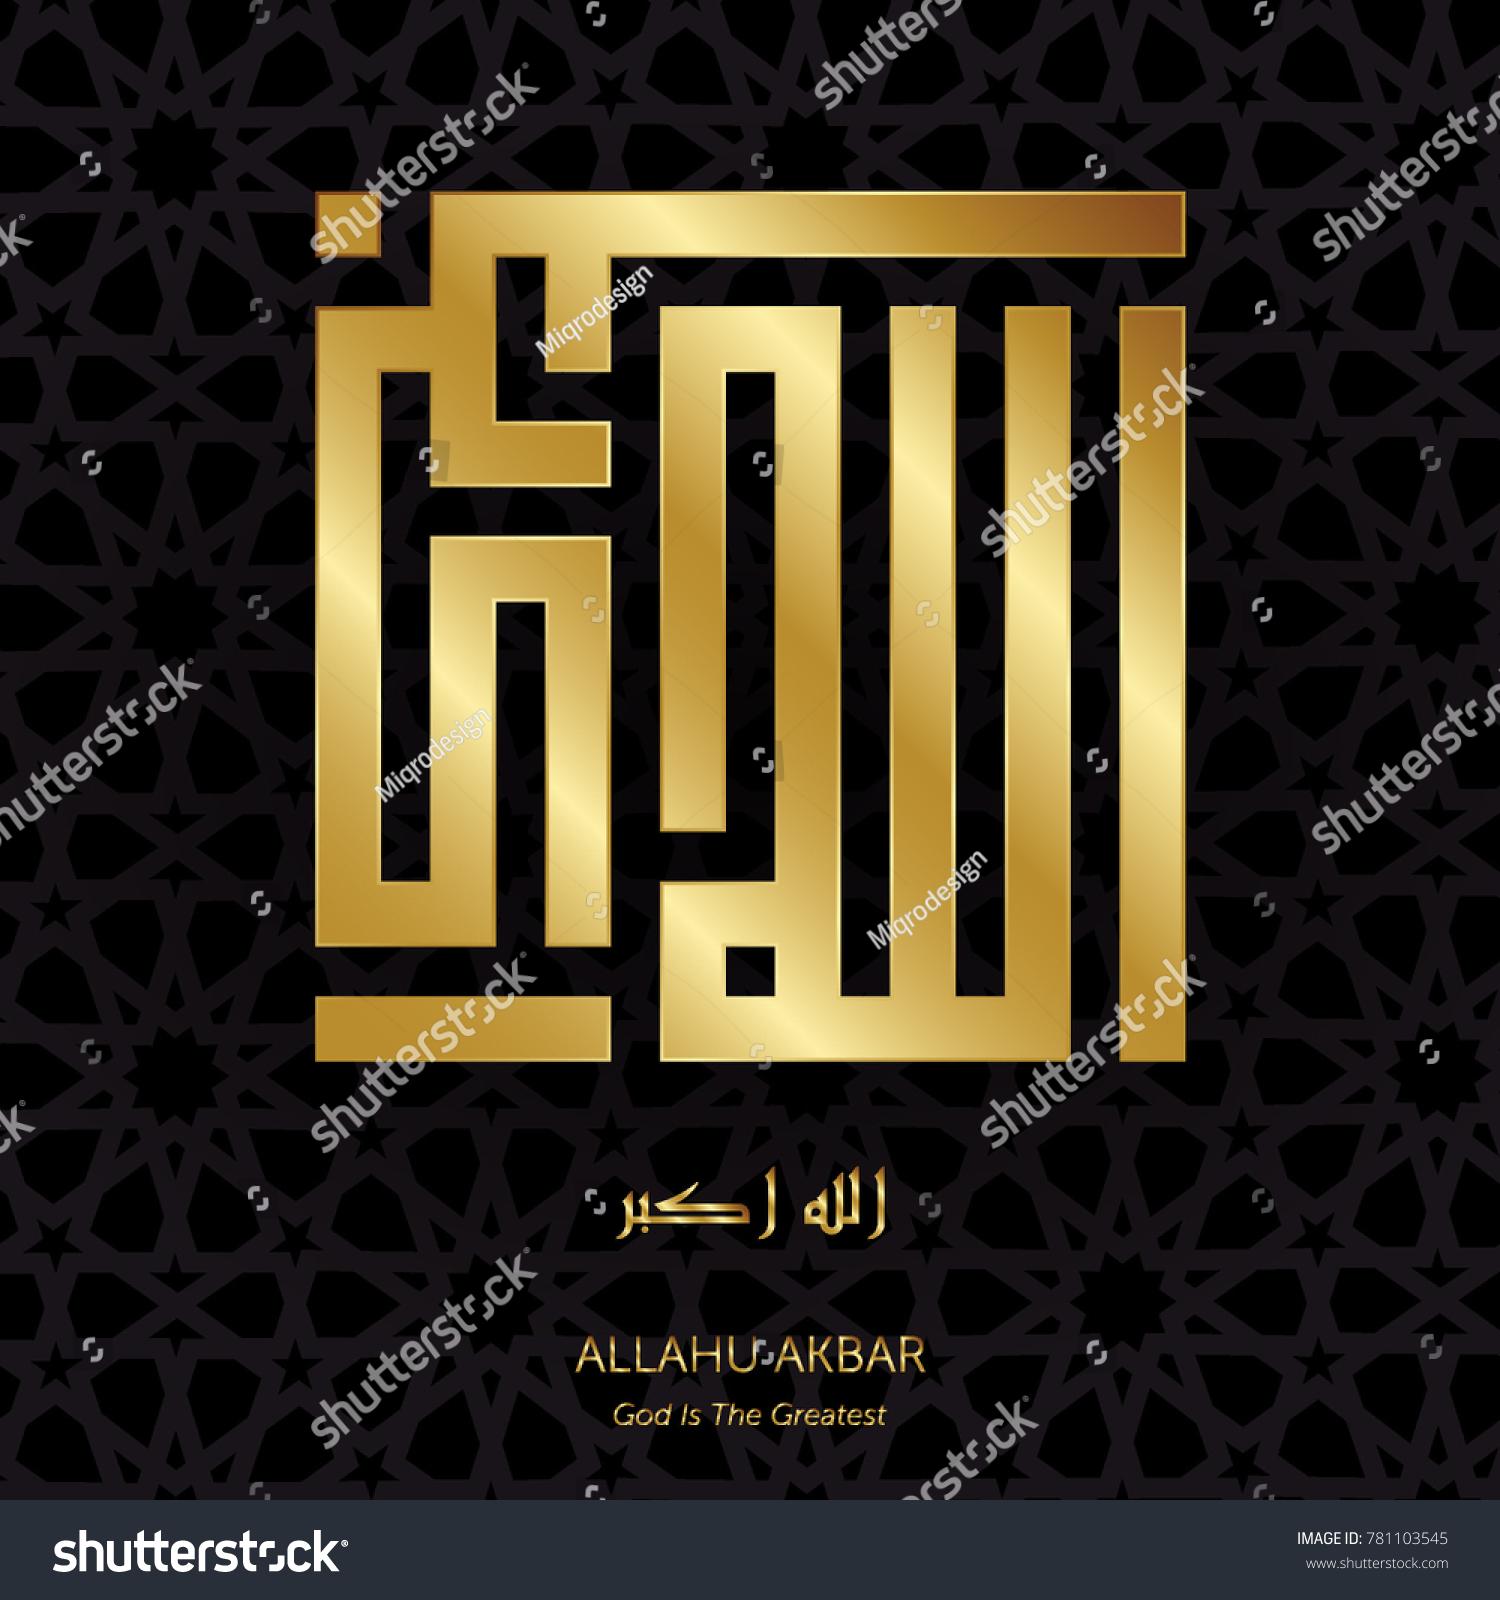 Allah Akbar Musique beautiful shine gold kufic calligraphy allahu stock vector (royalty